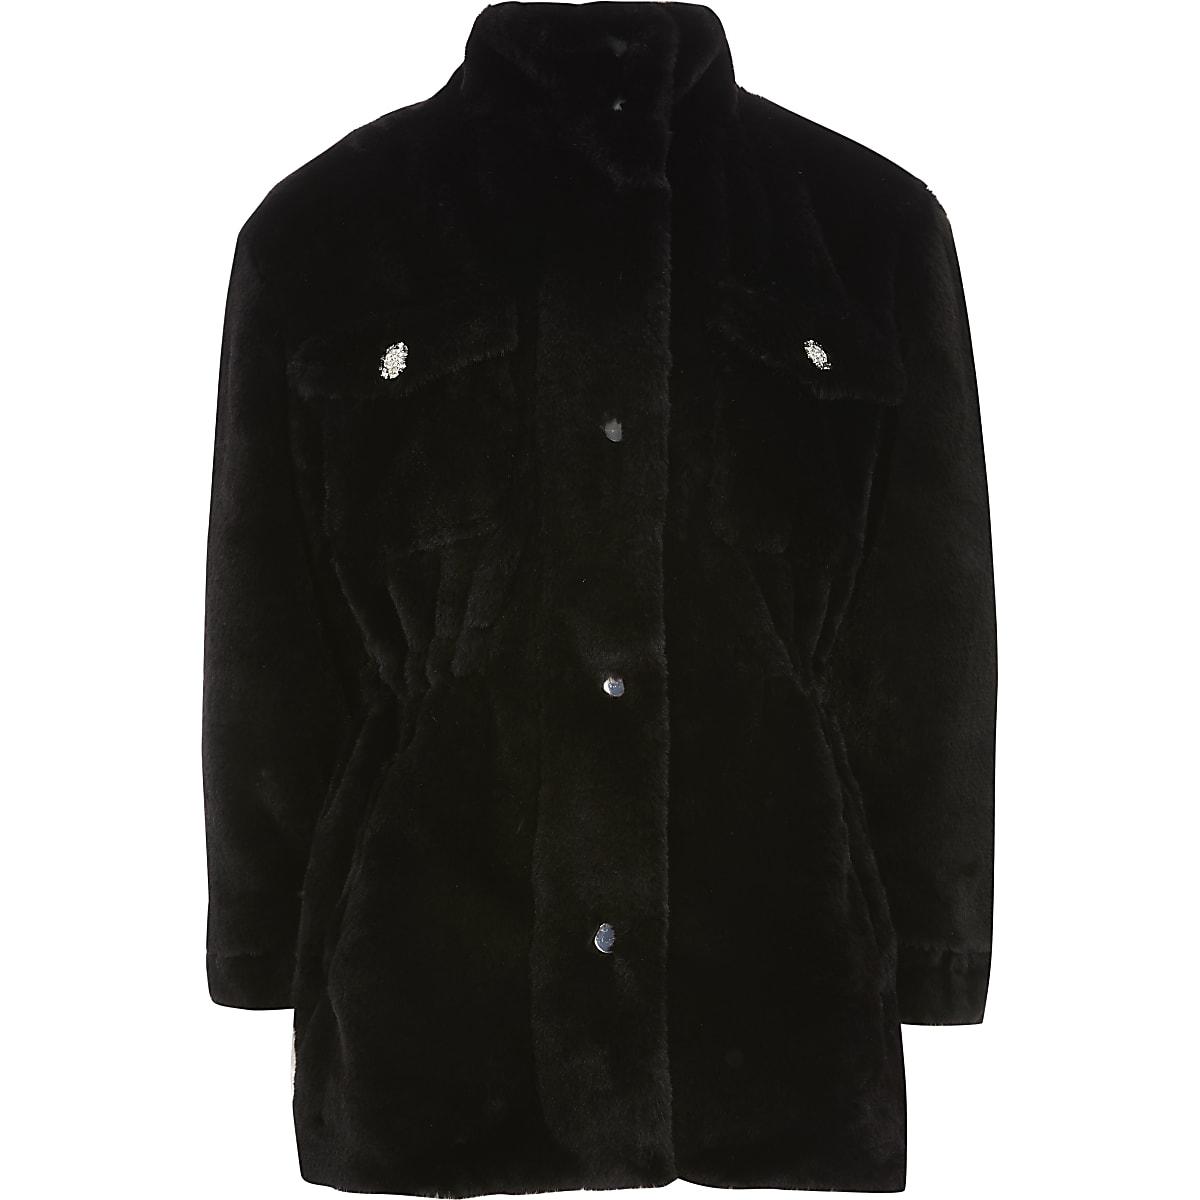 Girls black faux fur parka jacket